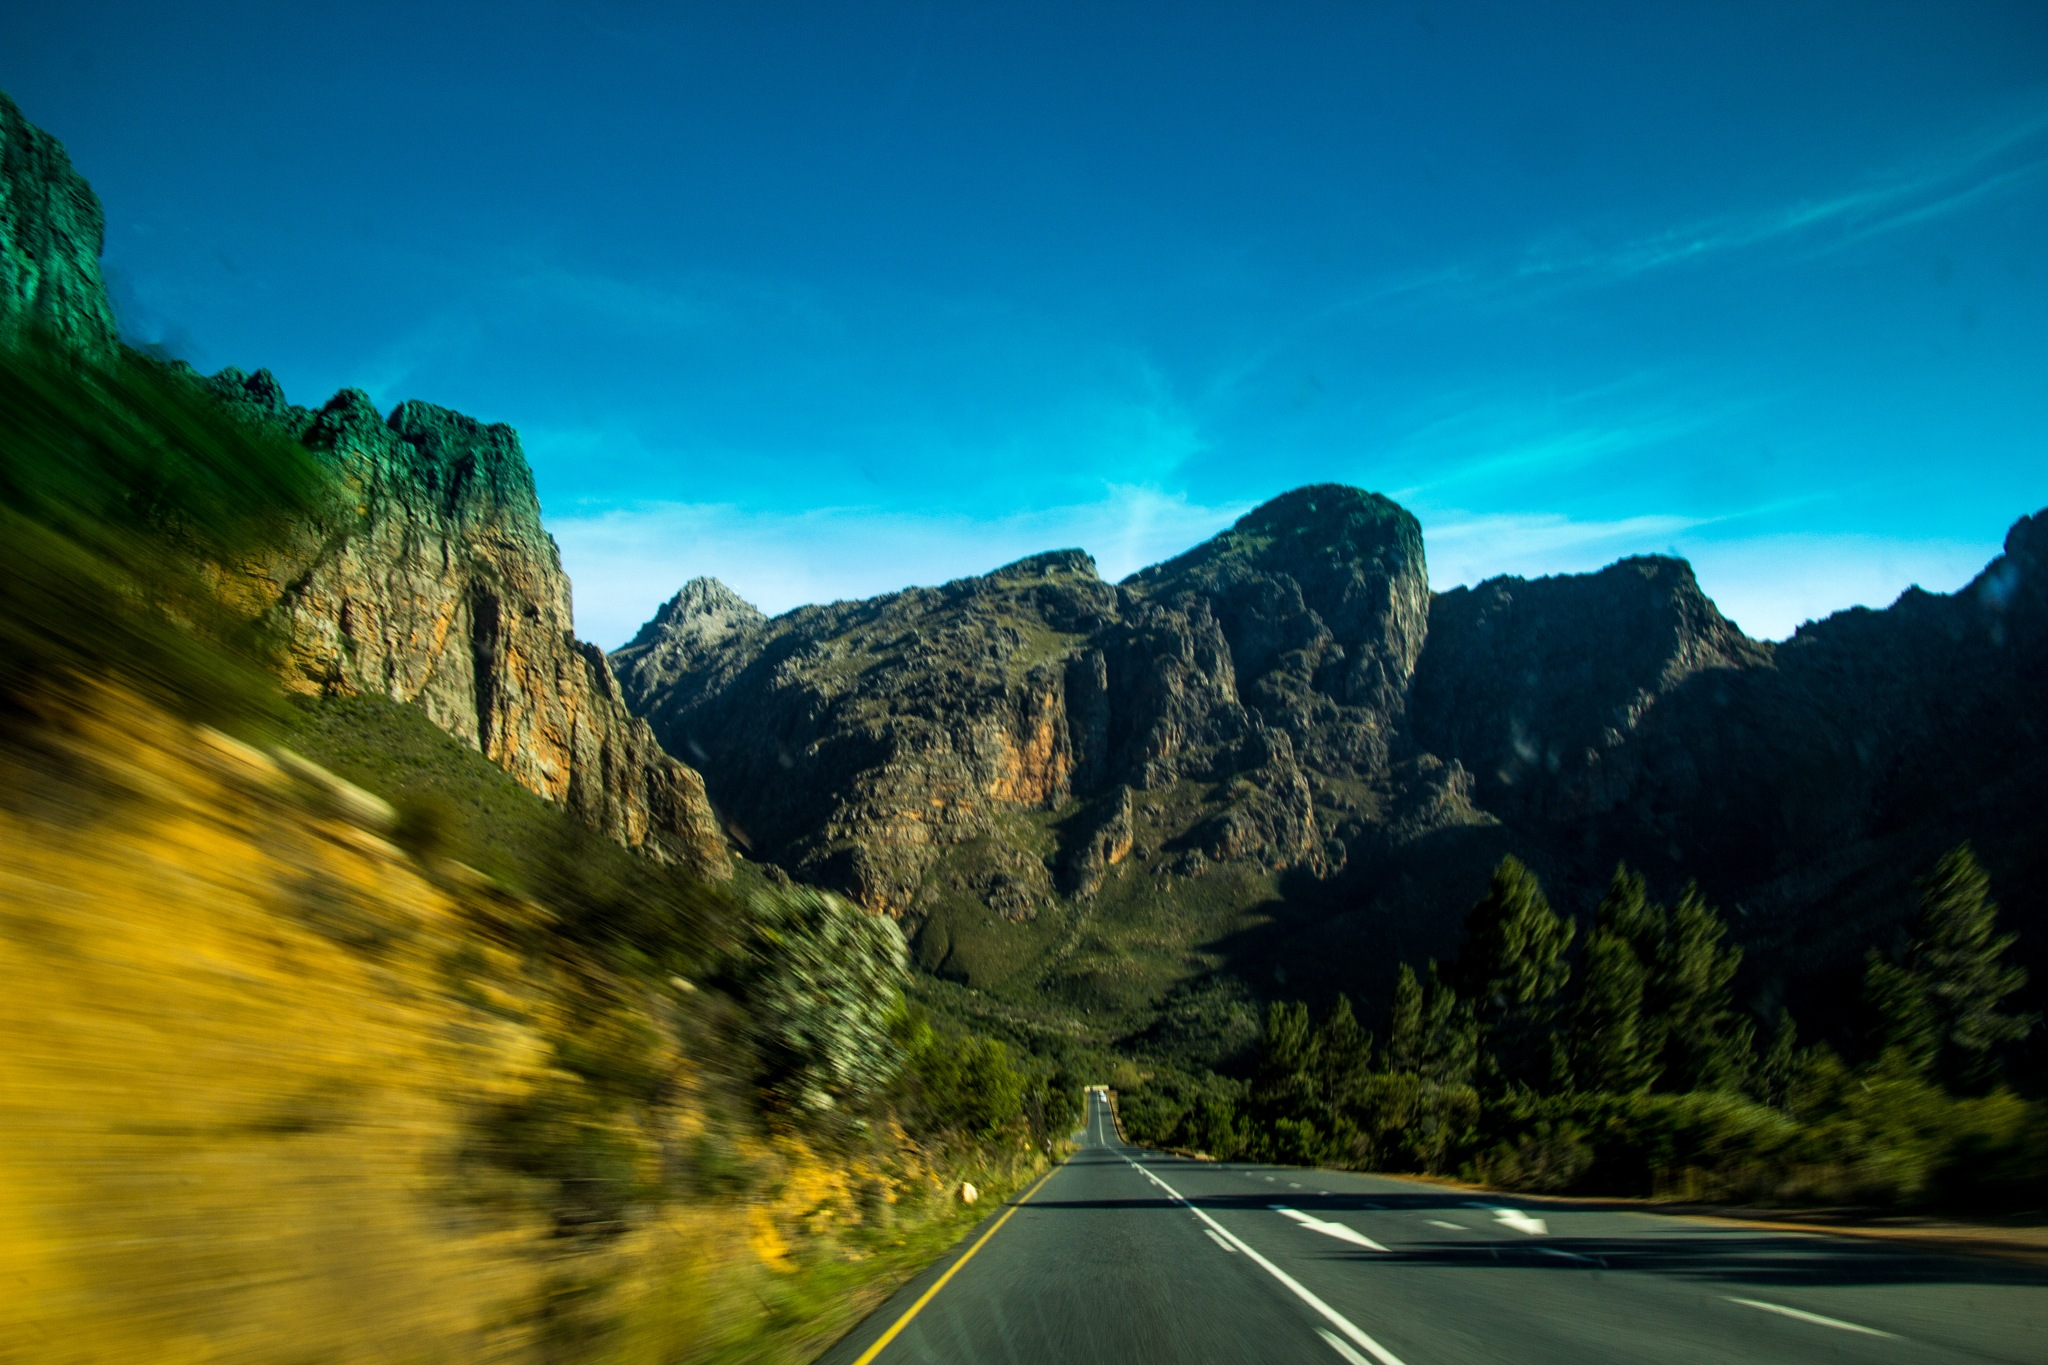 speeding down the mountain pass by Nauta Piscatorque